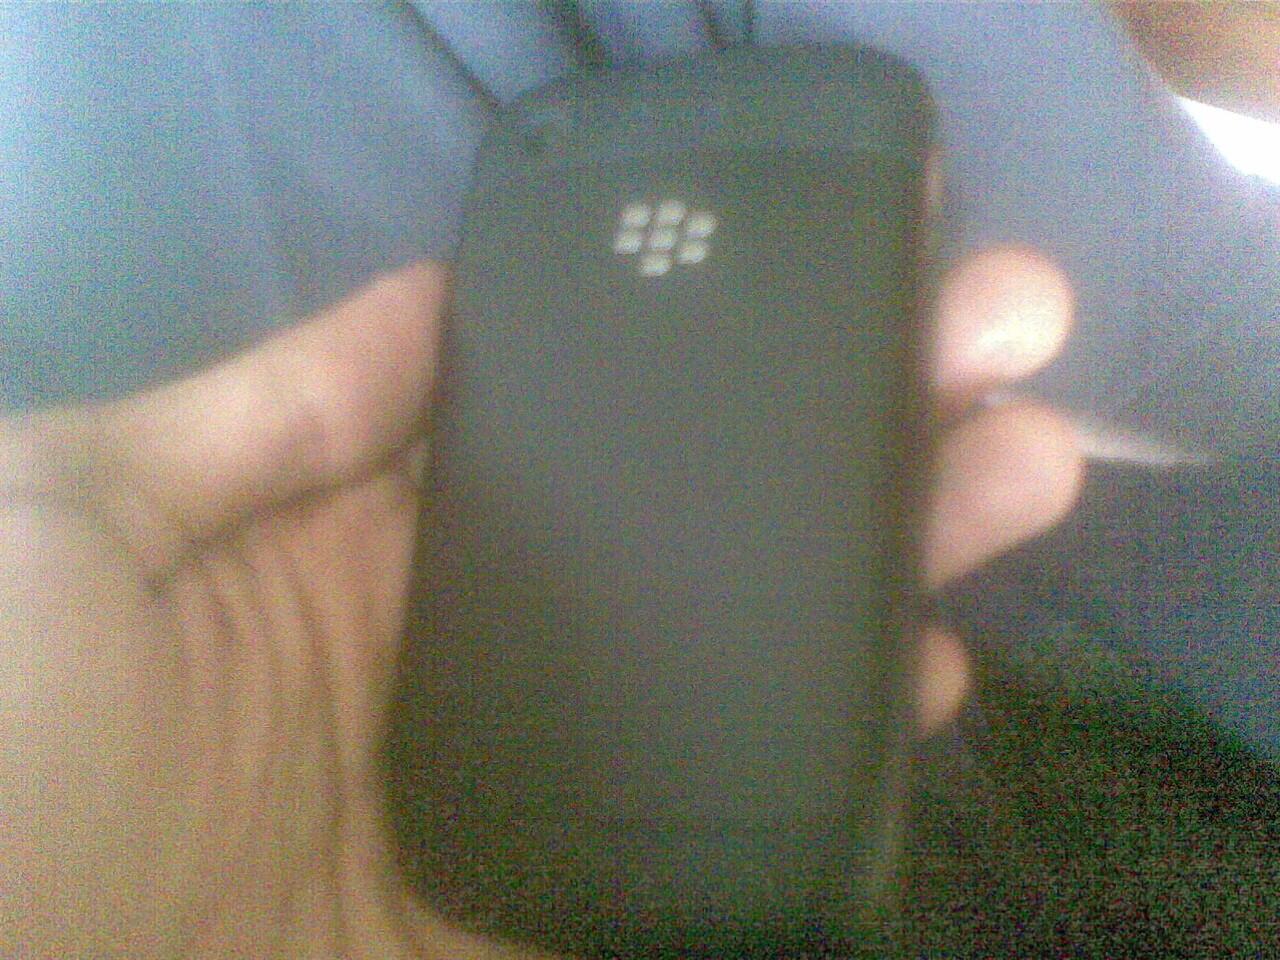 (Repost) Blackberry Gemini 3g 9300 black masih segel tam cod jakarta